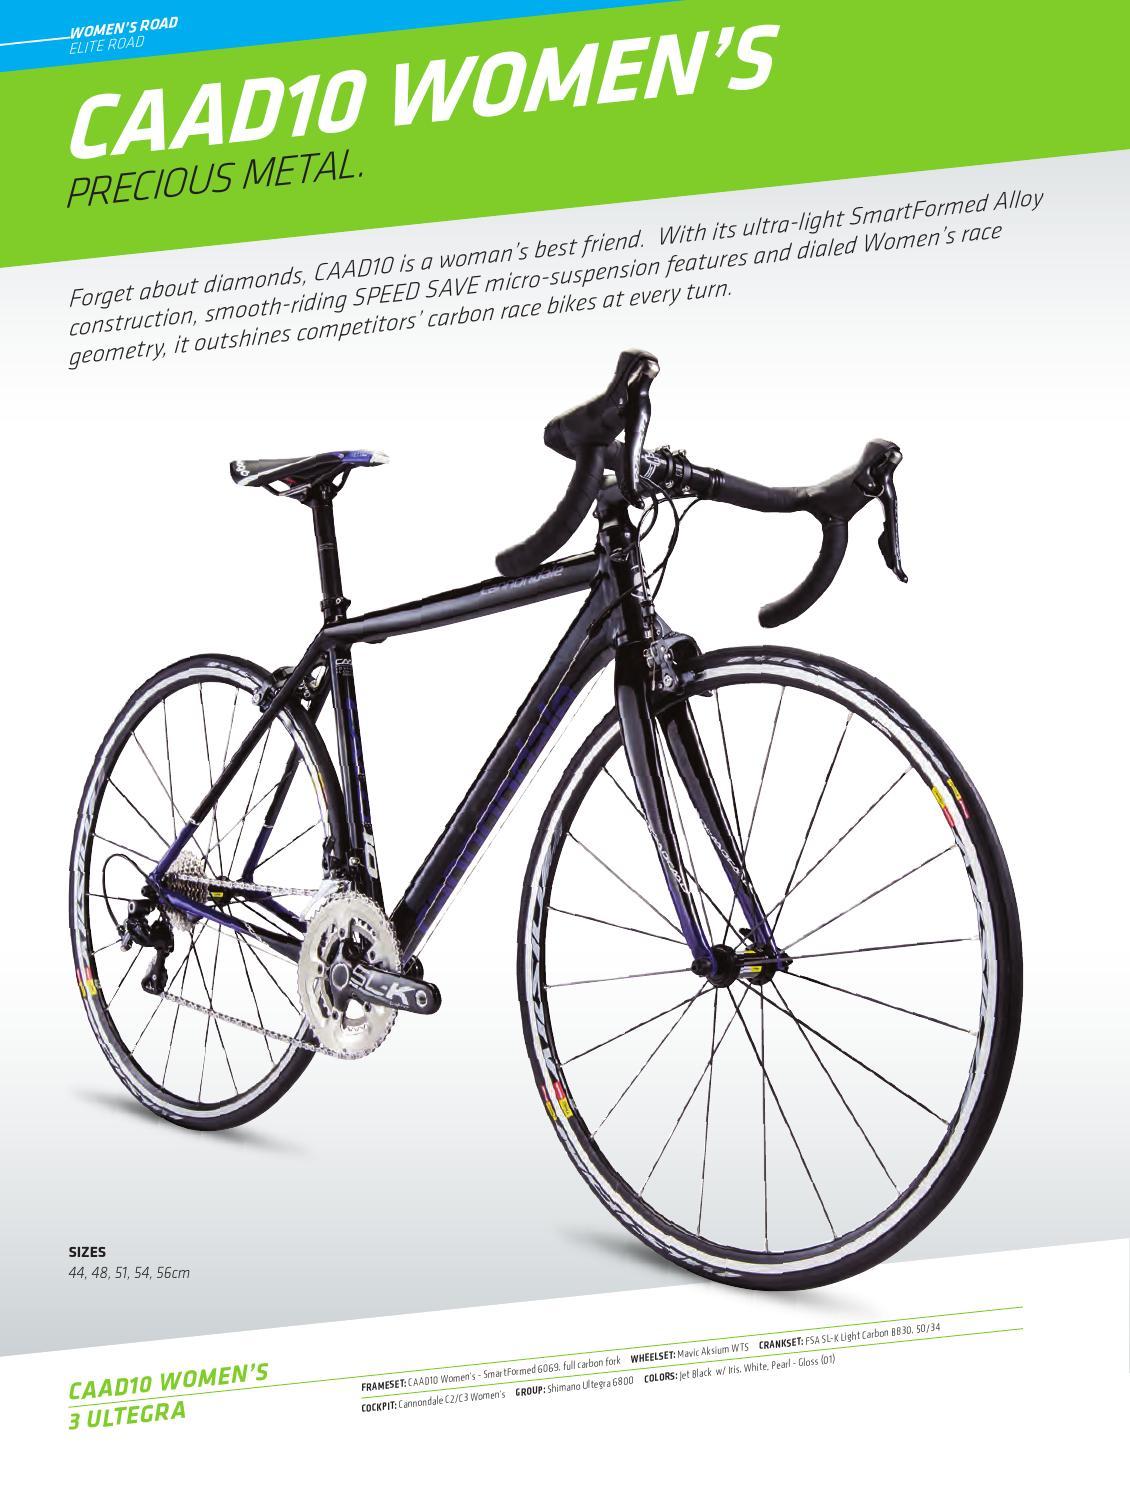 2014 Cannondale Bike Catalog by Cannondale_GLOBAL - issuu